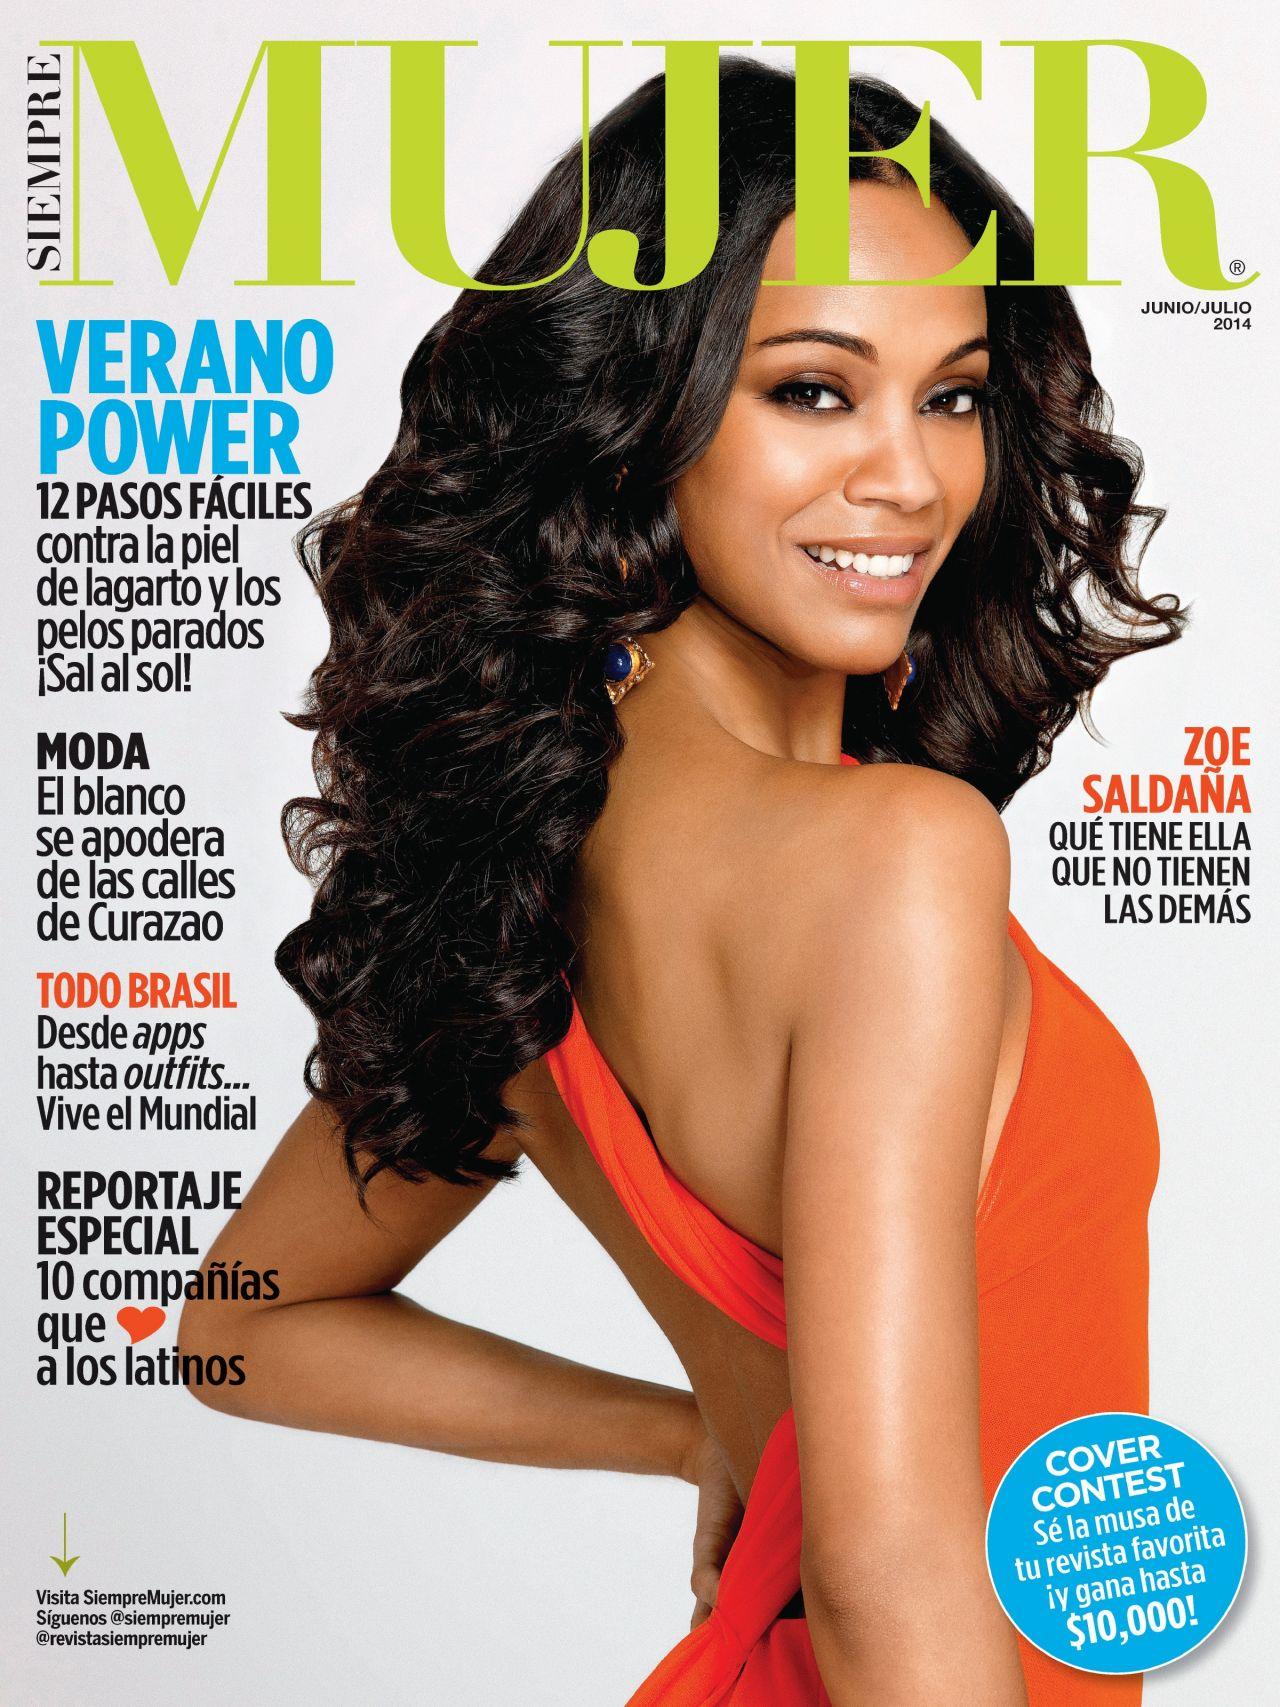 Zoe Saldana - Siempre Mujer Magazine June/July 2014 Issue